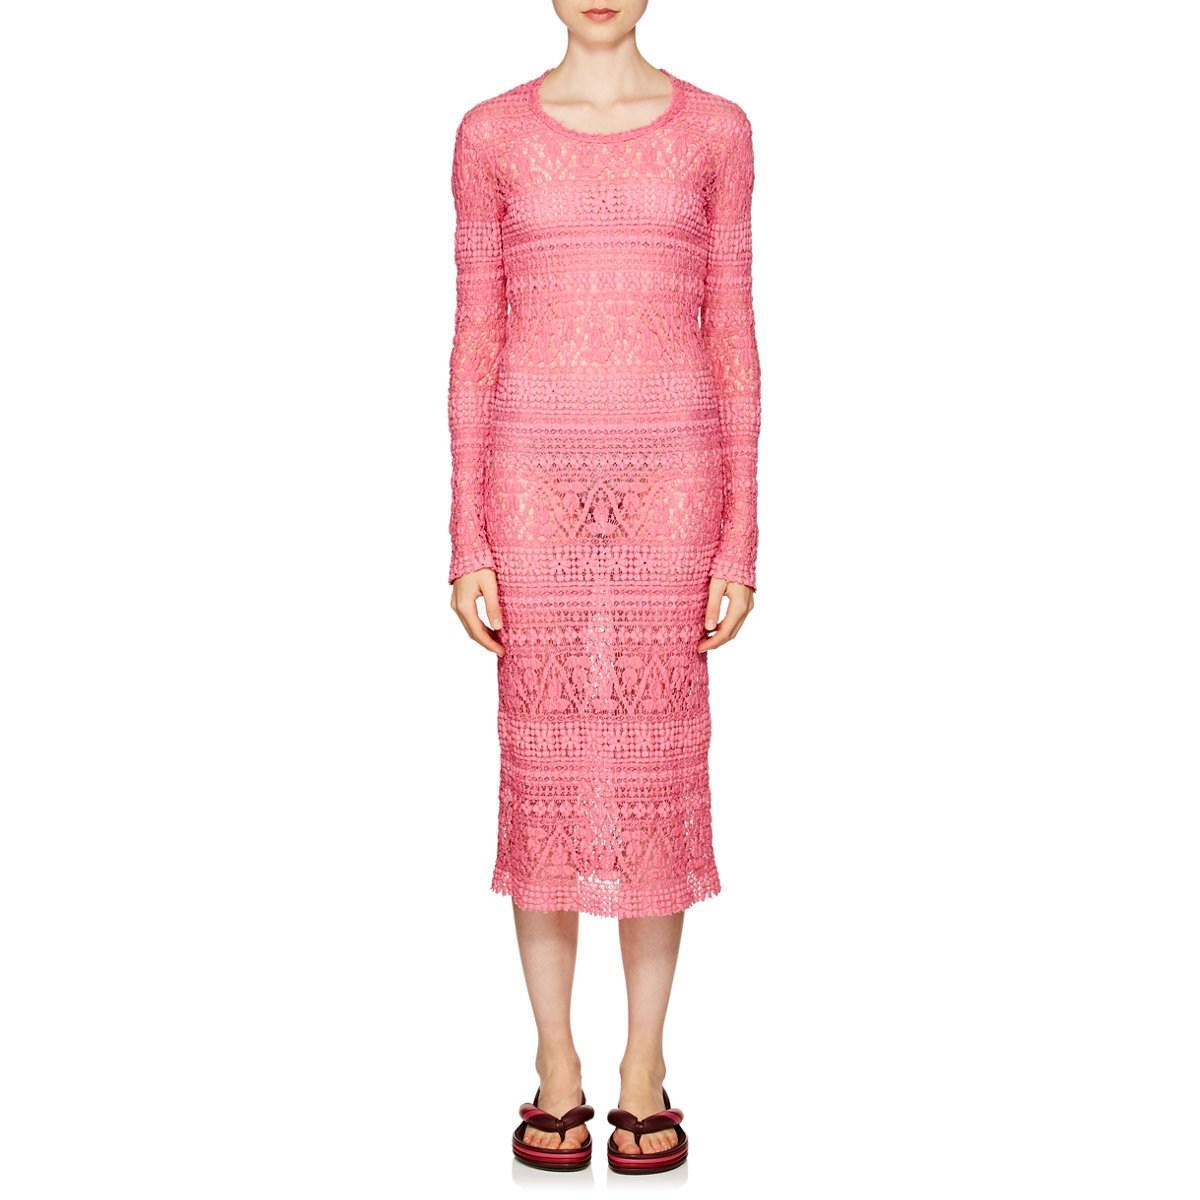 Dynamic Adorable Bodysuits 2017 New Summer Newborn Baby Girl Flower Jumpsuit Bodysuit Sunsuit Outfits Girls Clothes 0-24m Bodysuits Girls' Baby Clothing